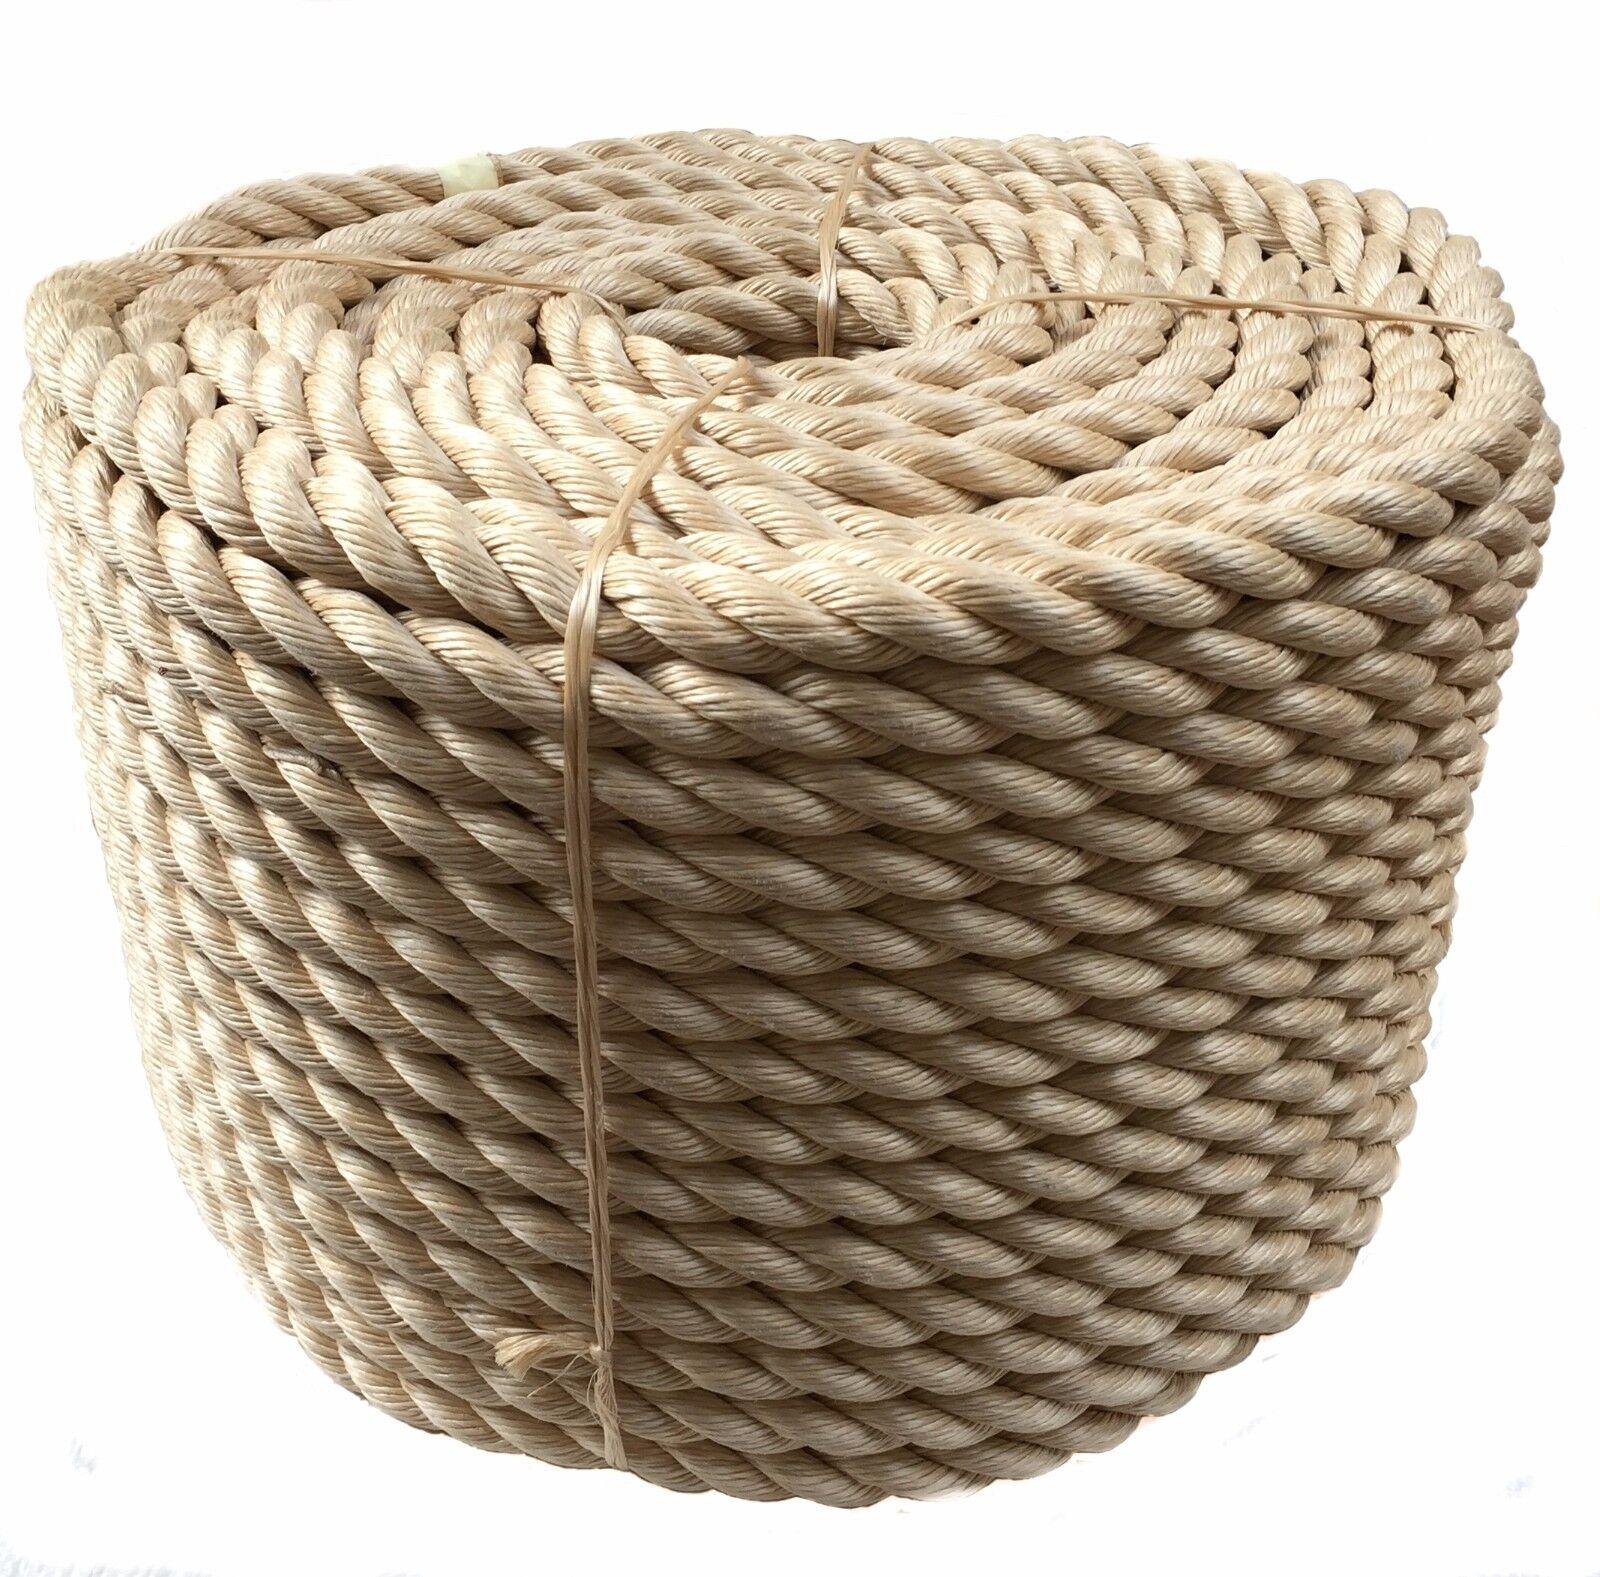 15 Metres X 48mm Synthetic Sisal 3 Strand Decking Rope, Sisal Rope, Decking,